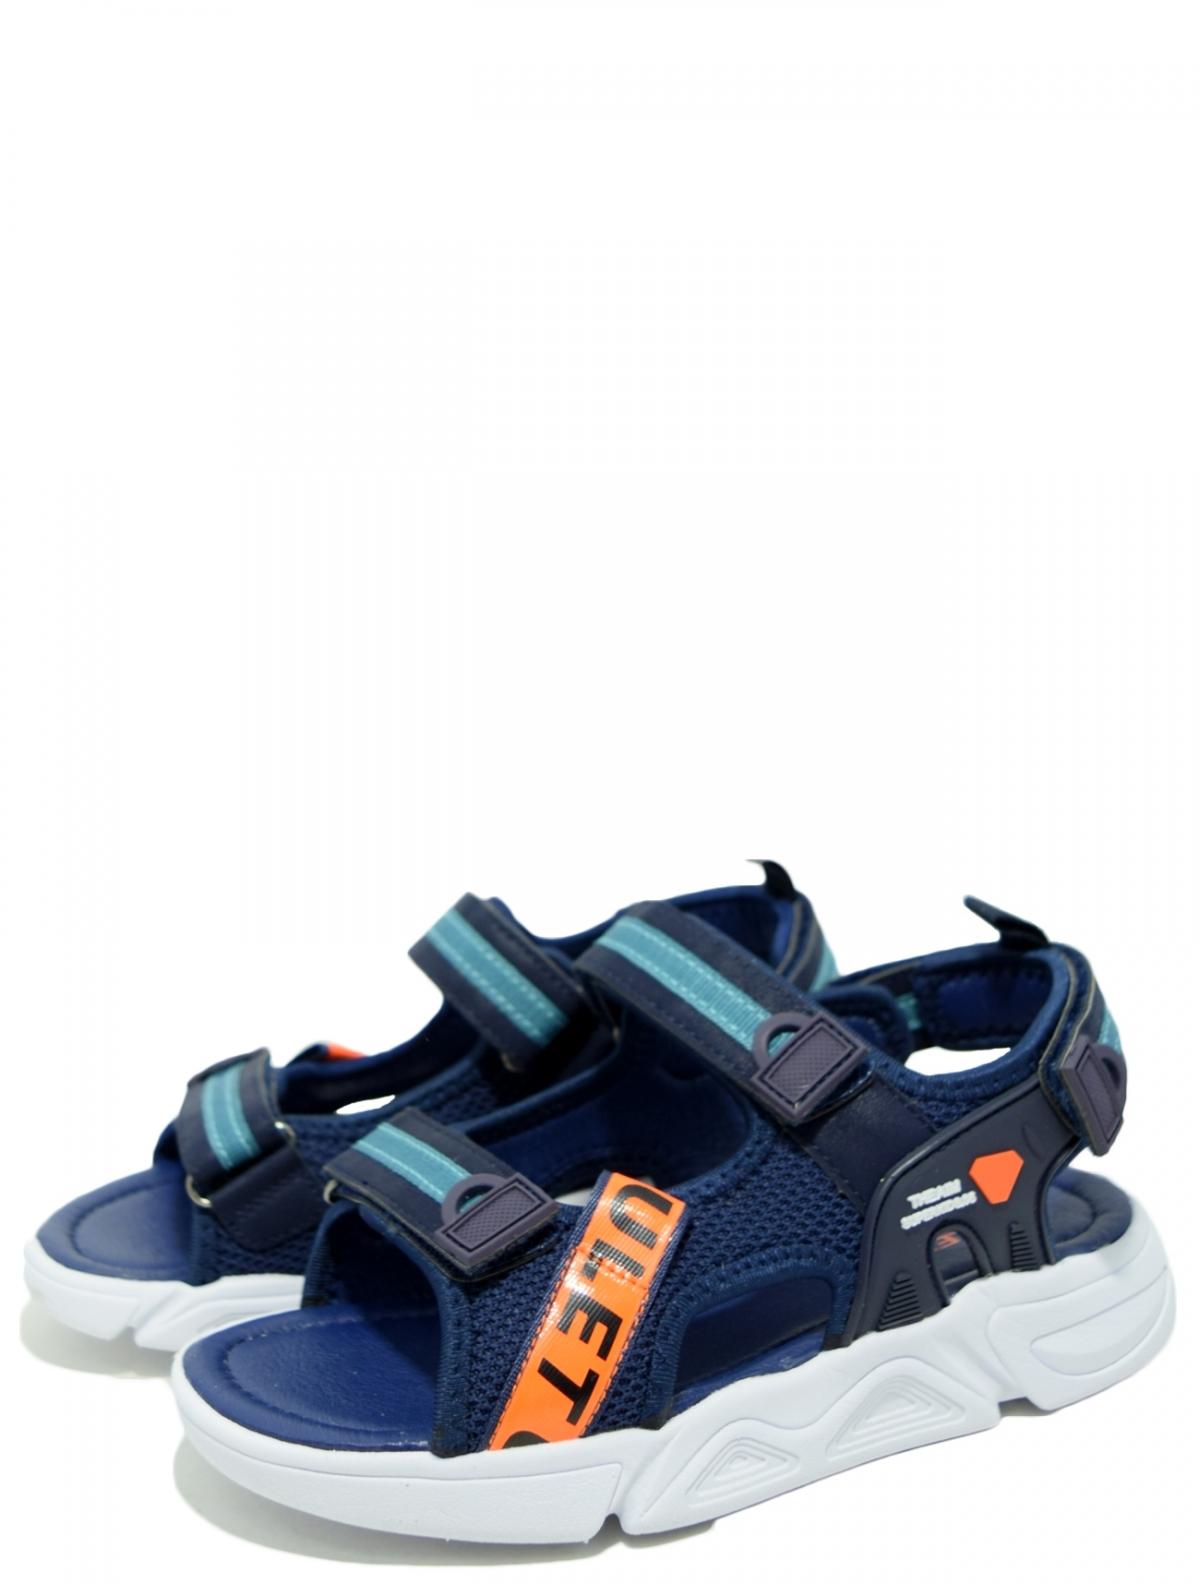 Ulet HS3001-2 сандали для мальчика